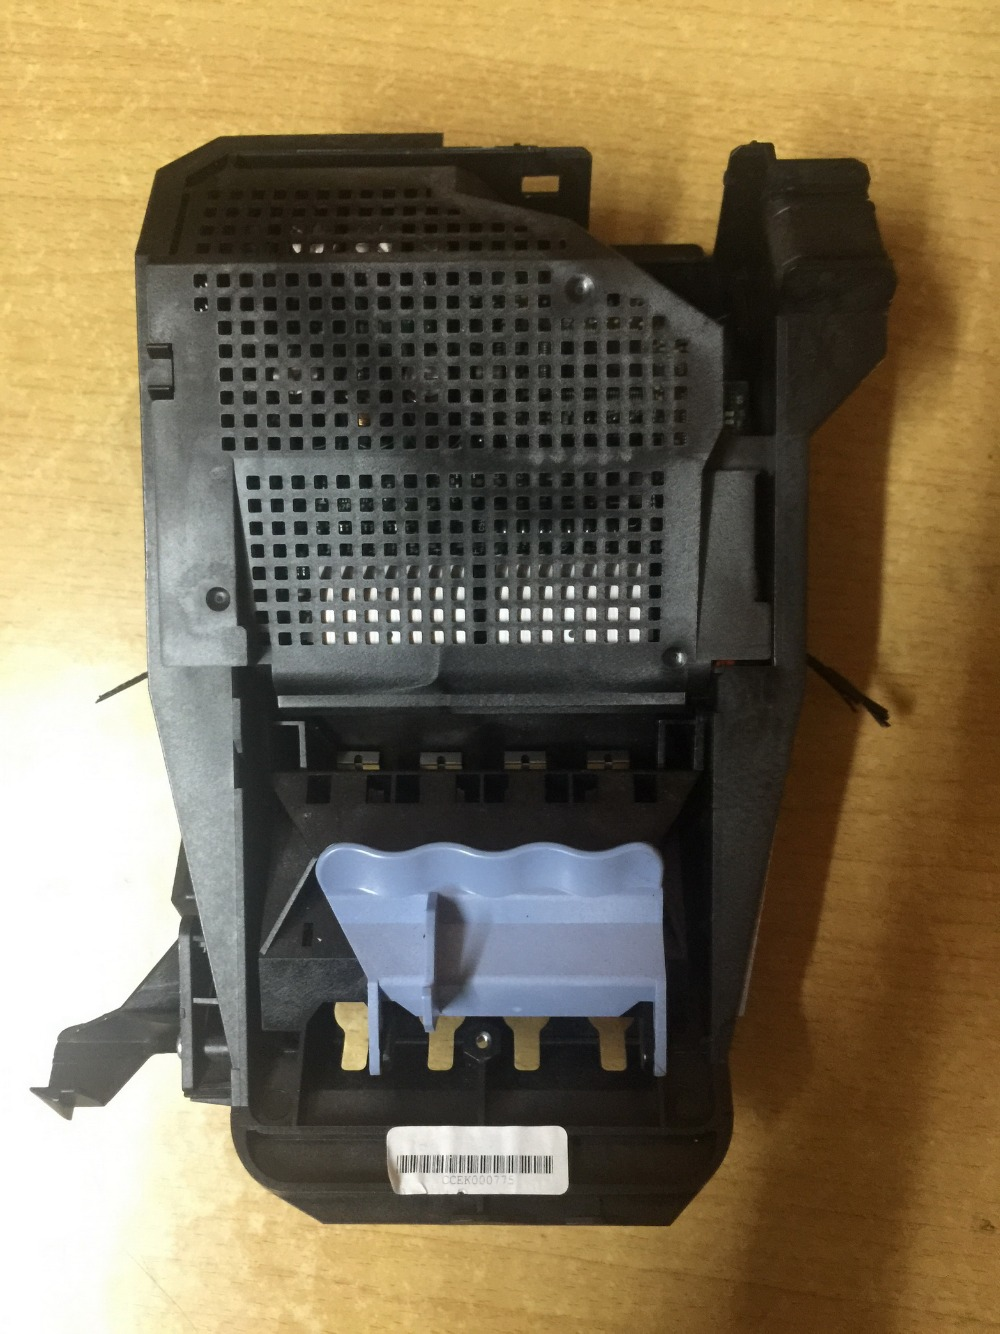 INK CARTRIDGE HOLDER SERVICE STATION C7769 C7770 FOR HP DesignJet 500 800 510 A1 A0 PRINTER PLOTTER(China (Mainland))